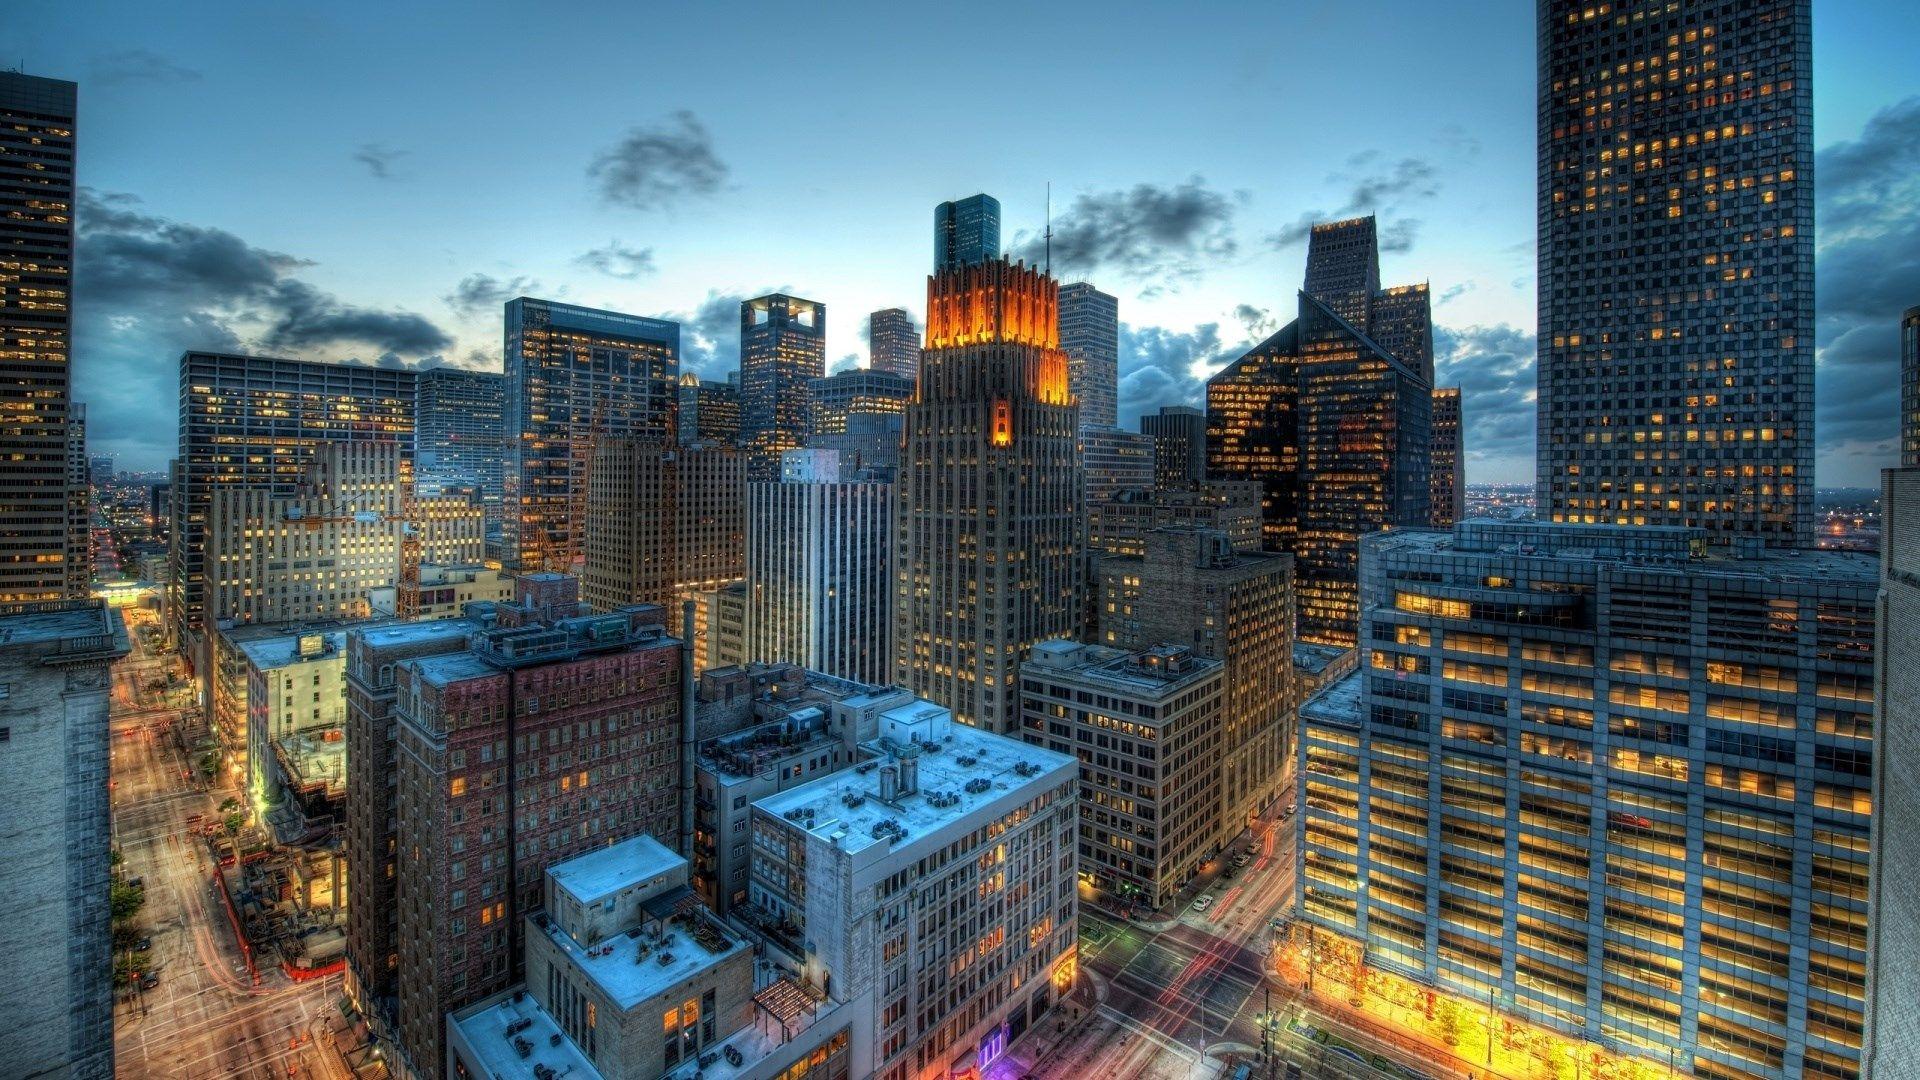 houston skyline wallpaper 1920x1080 Houston skyline